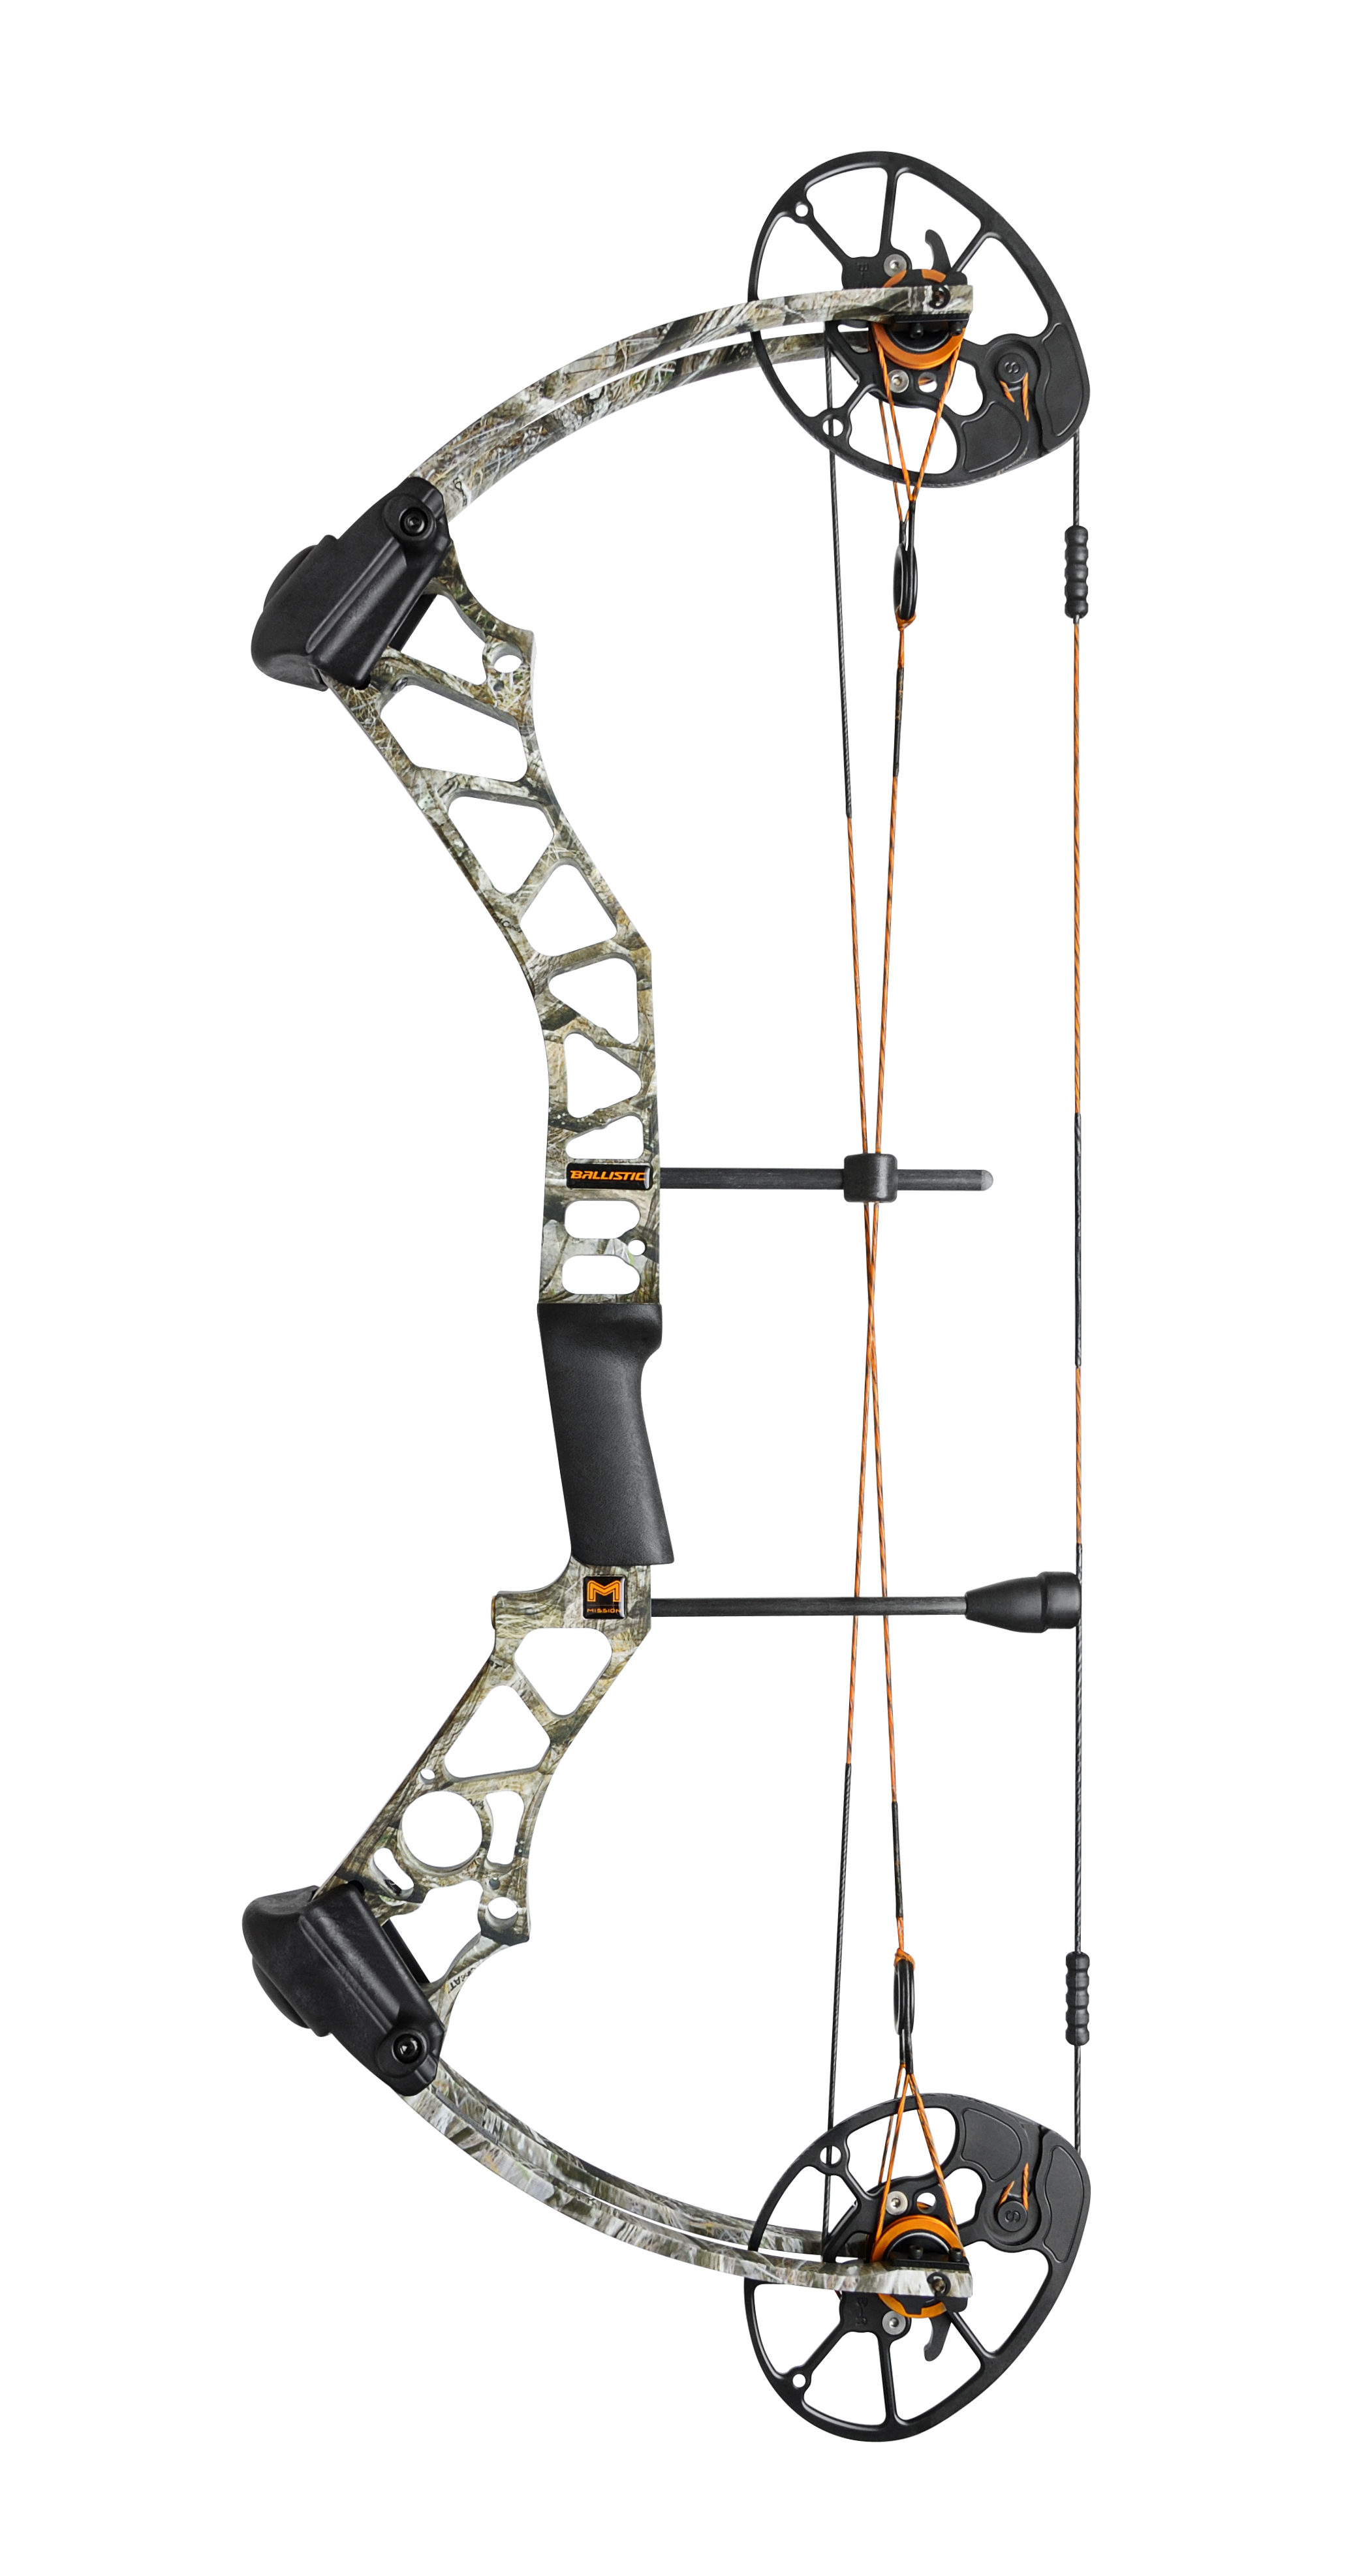 mission archery introduces the 2013 ballistic